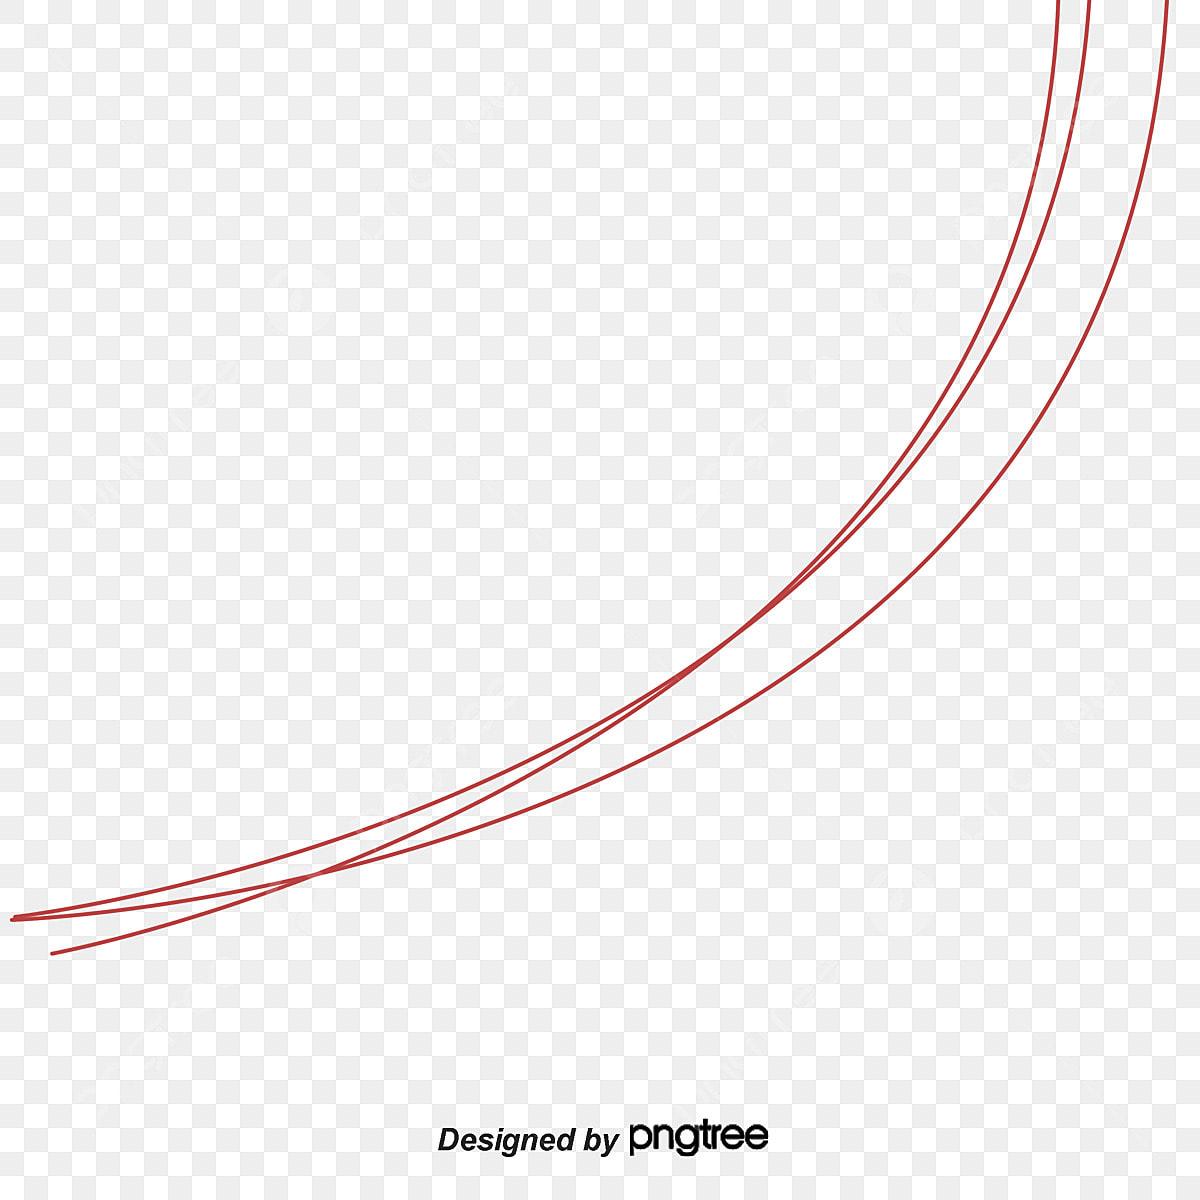 خط خط Png وملف Psd للتحميل مجانا